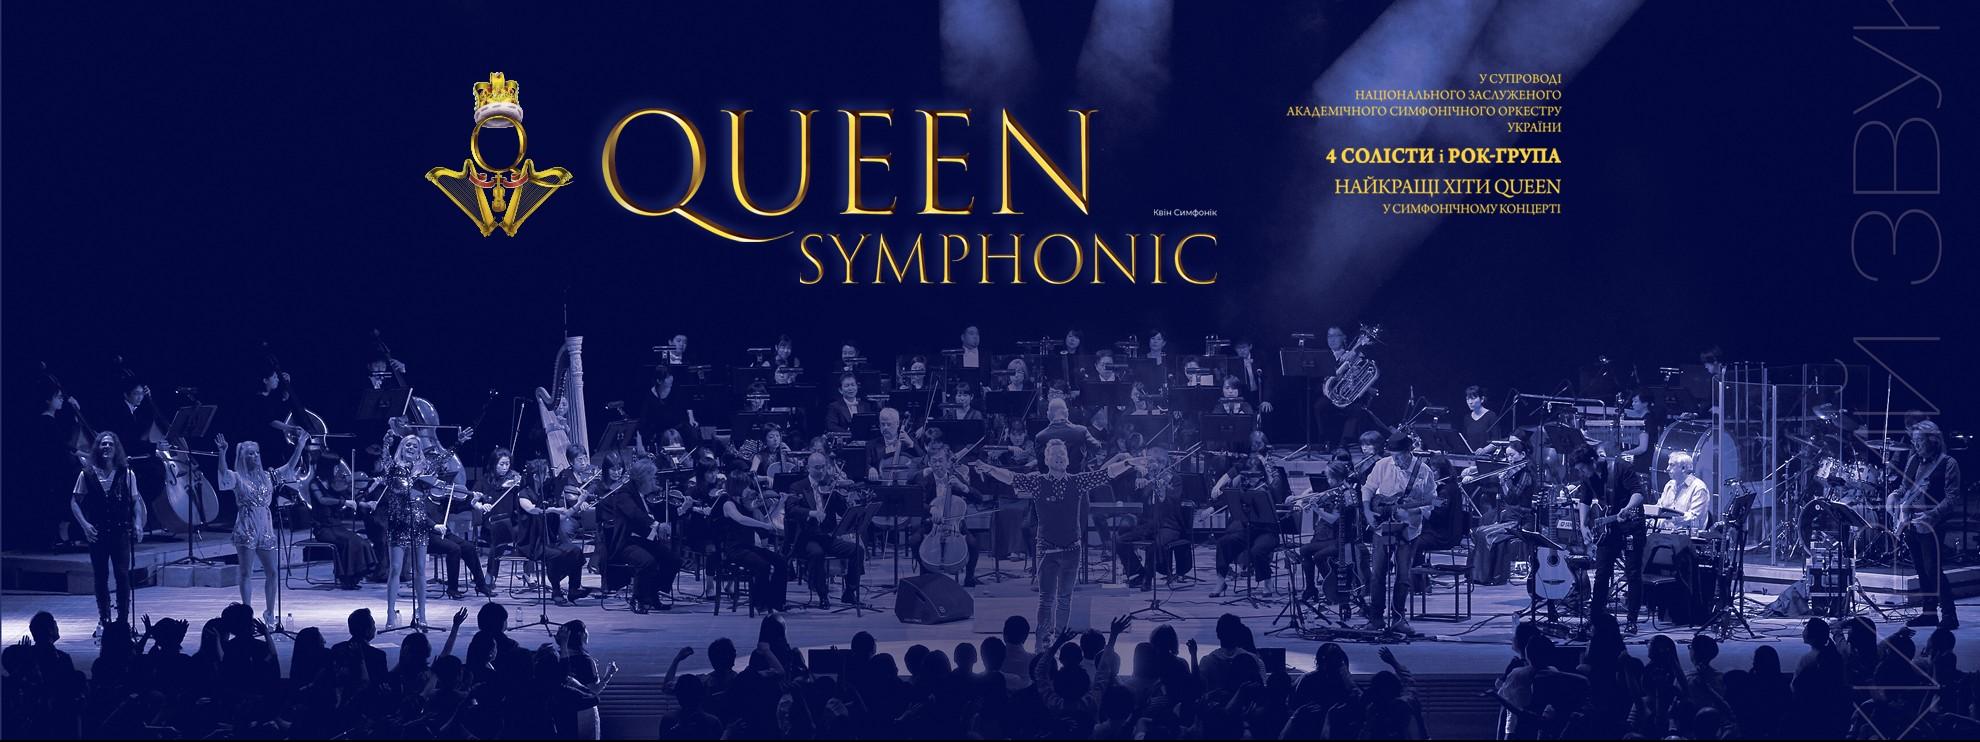 event Queen Symphonic